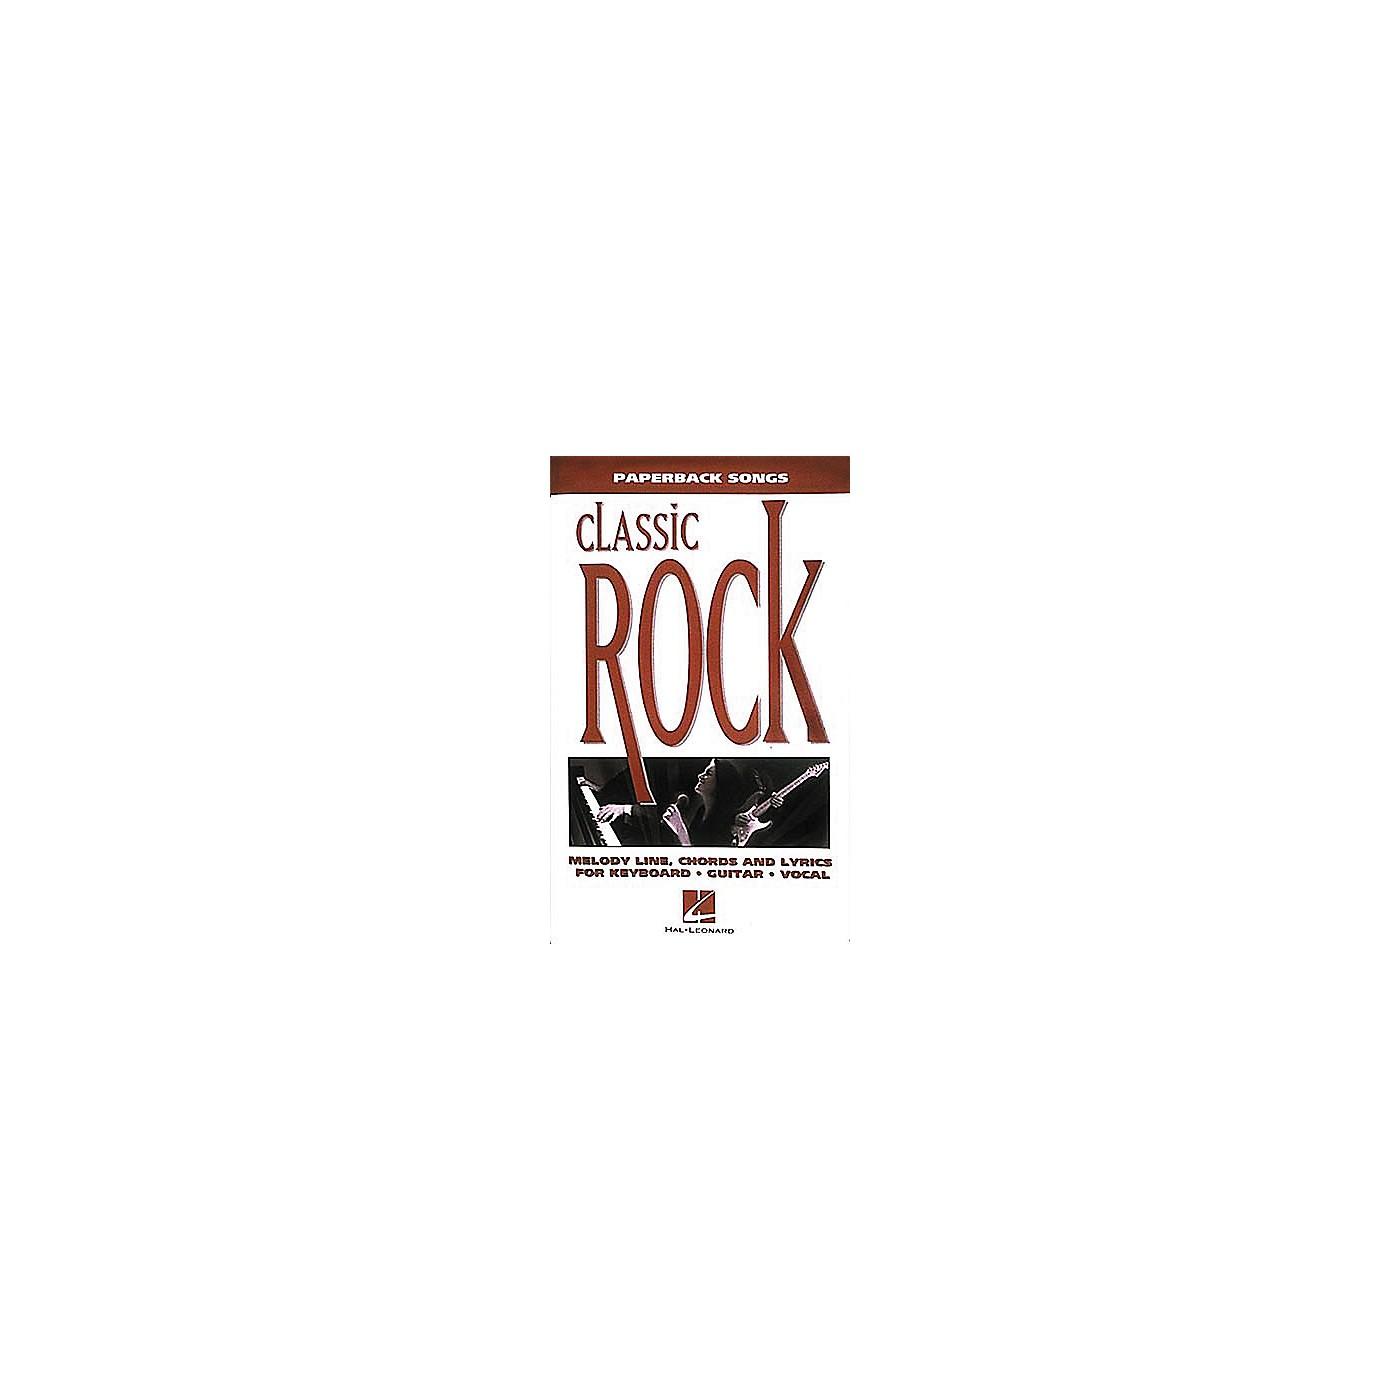 Hal Leonard Paperback Songs - Classic Rock Book thumbnail